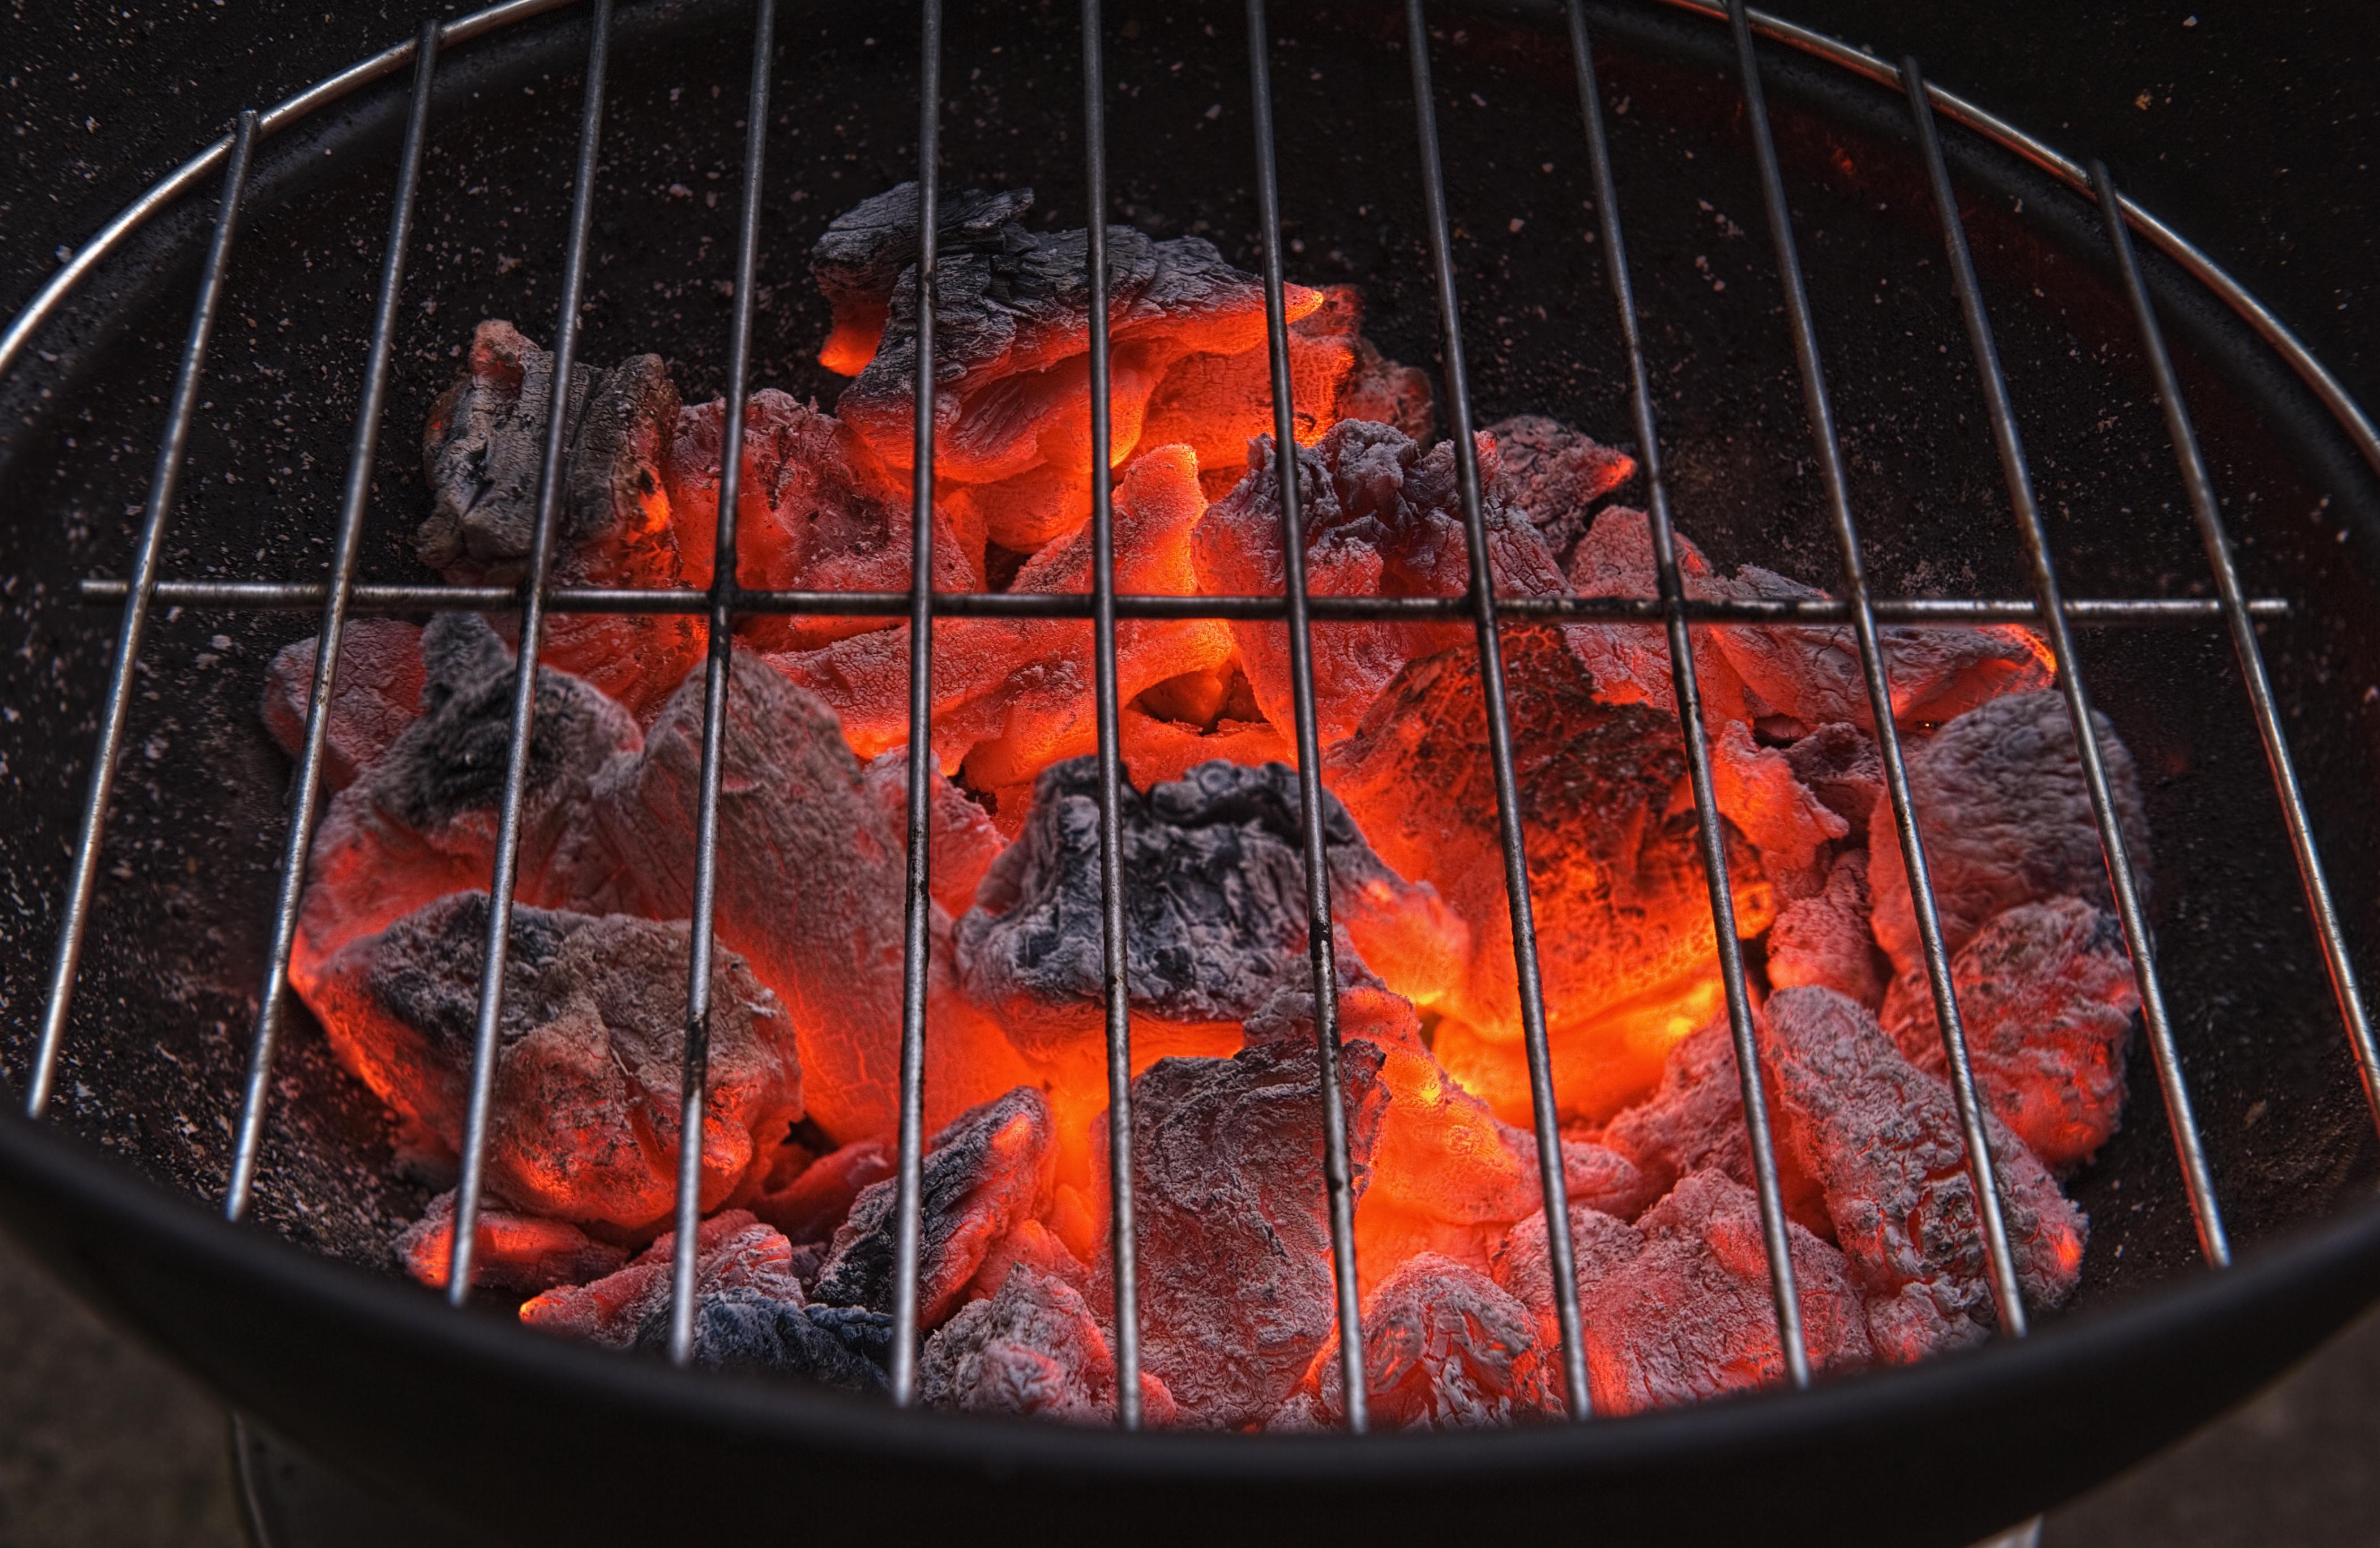 Hofstädter Richtig grillen mit Holzkohle